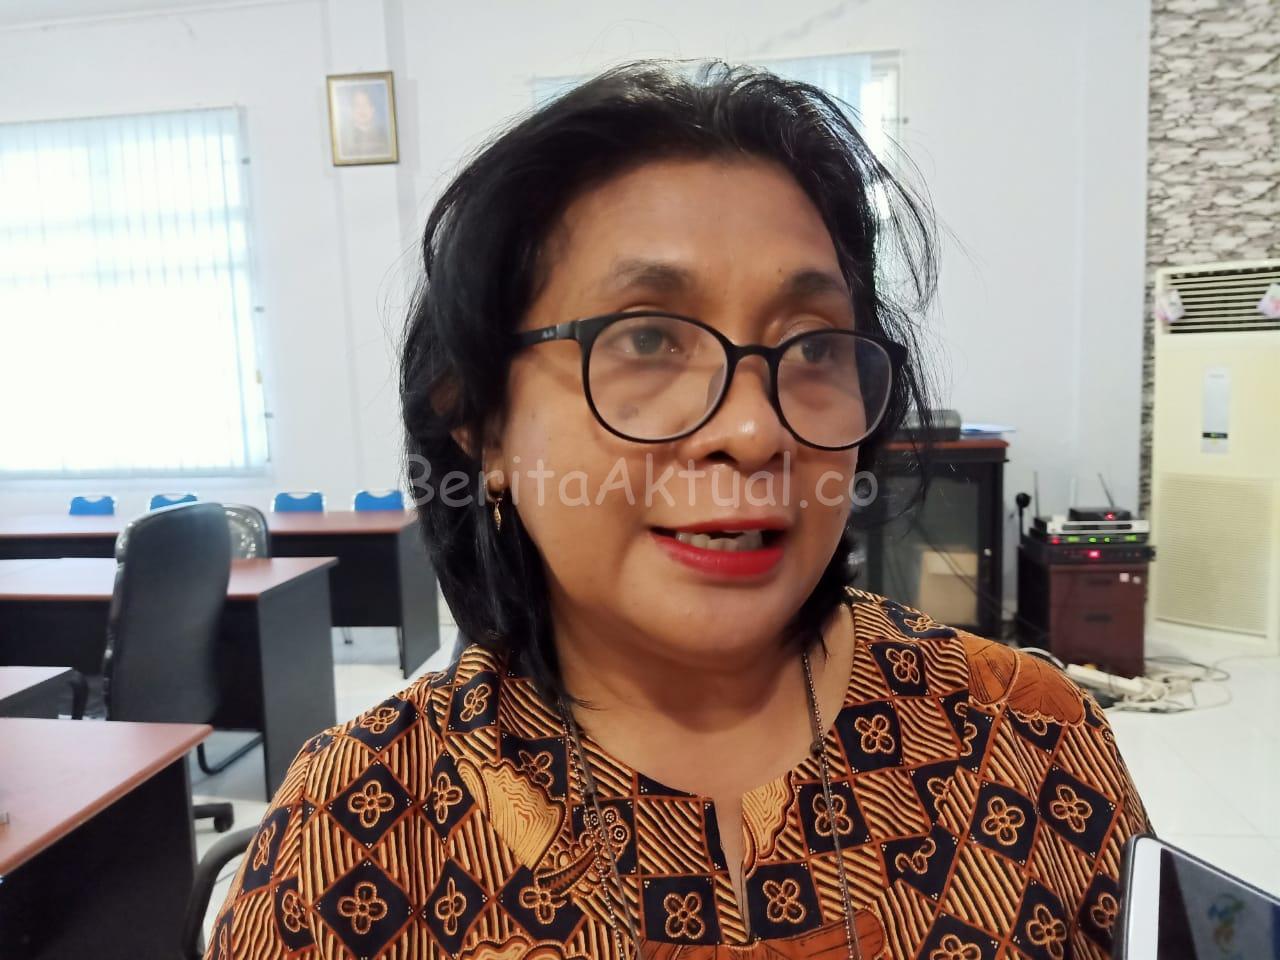 Pengangguran Terbuka di Papua Barat 484.175 Orang, Meningkat 5,01 Persen 1 IMG 20200506 WA0000